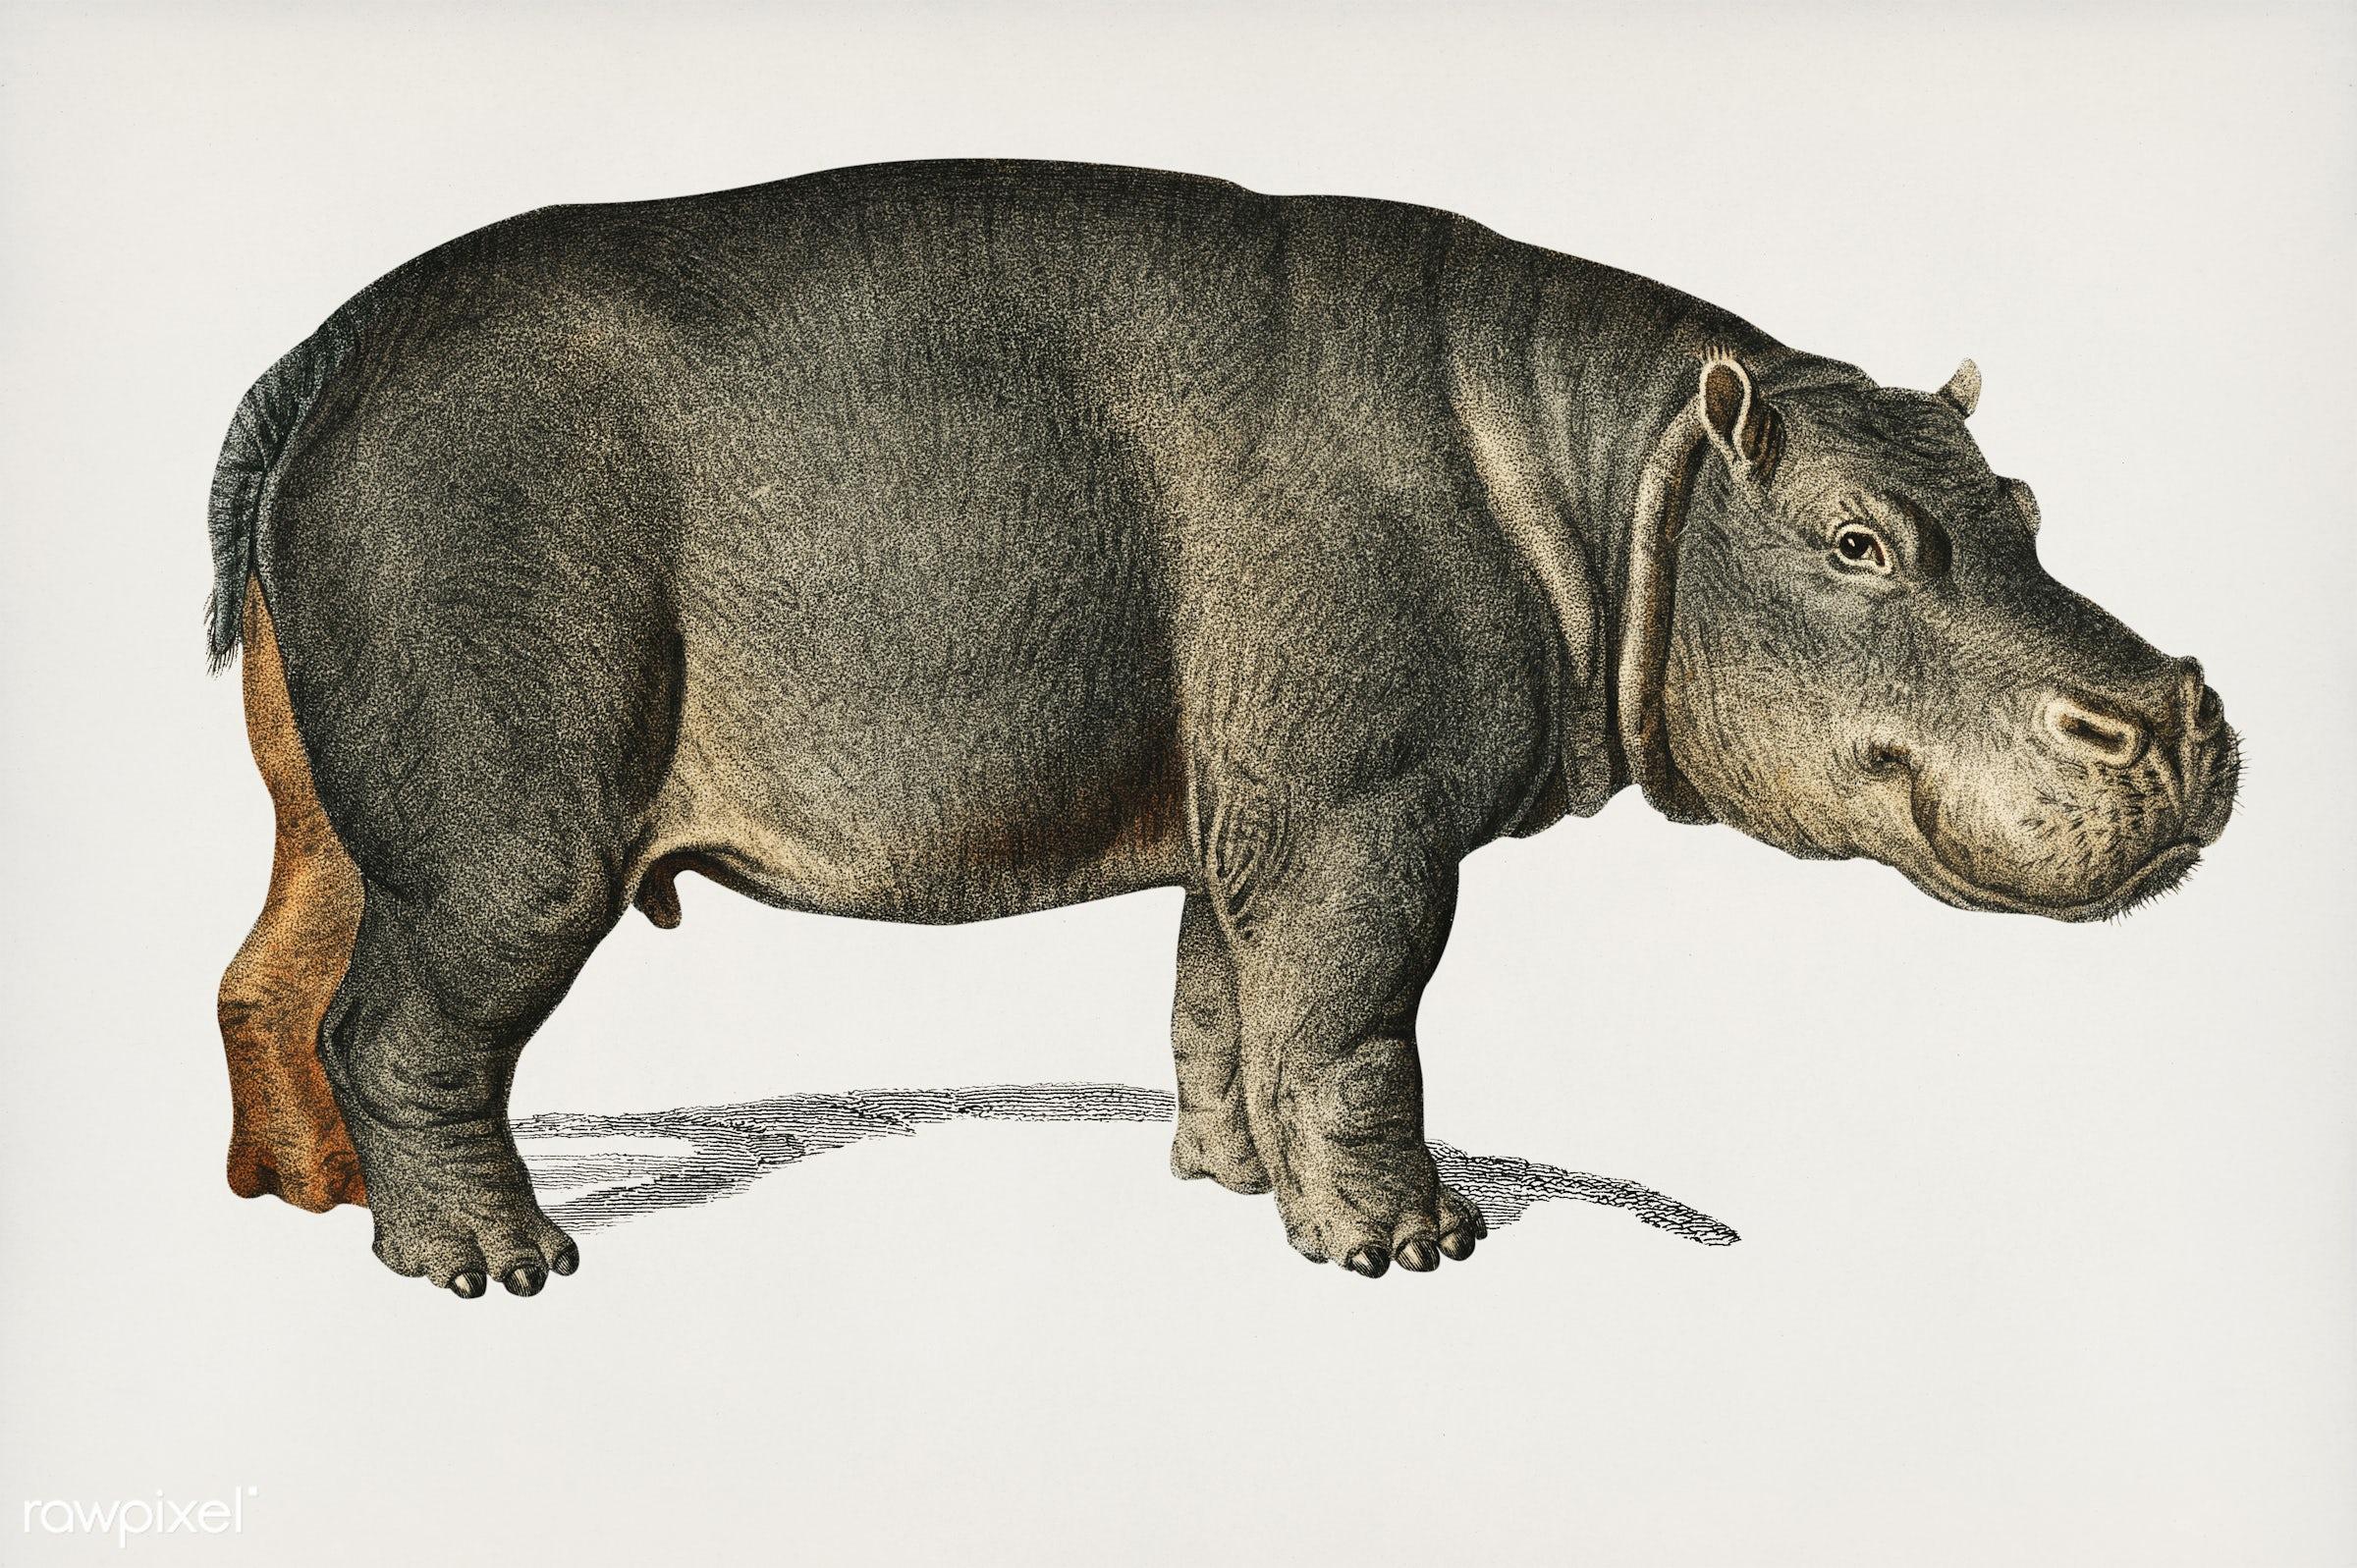 Hippopotamus (Hippopotame Amphibie) illustrated by Charles Dessalines D' Orbigny (1806-1876). Digitally enhanced from...